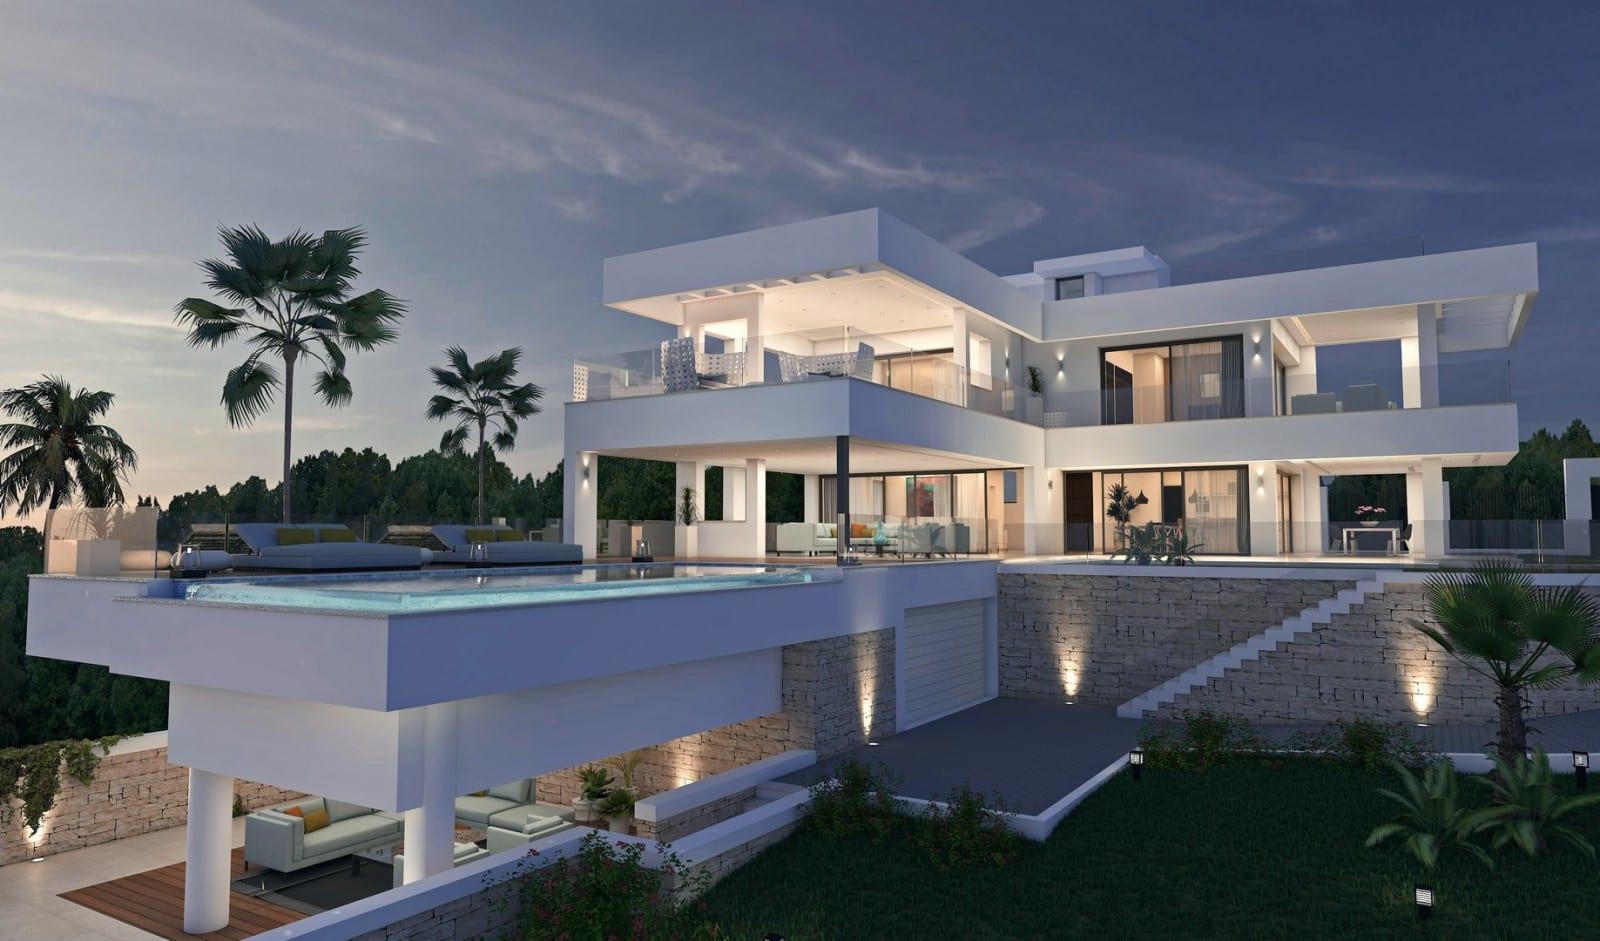 Vendu construire villa moderne similaire nueva andalucia for Construire villa